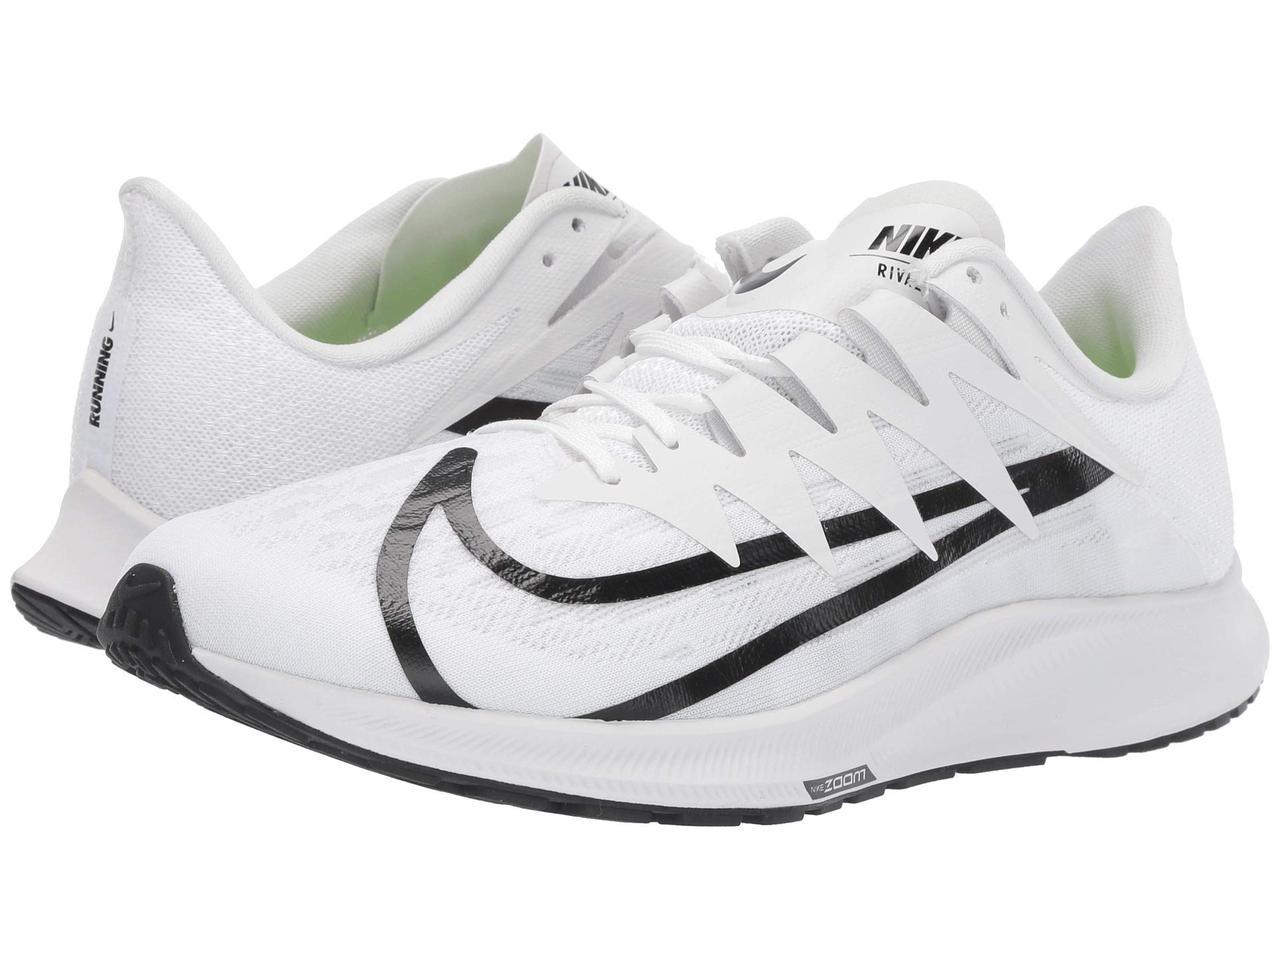 06c20f51 Кроссовки/Кеды (Оригинал) Nike Zoom Rival Fly White/Black/Platinum Tint